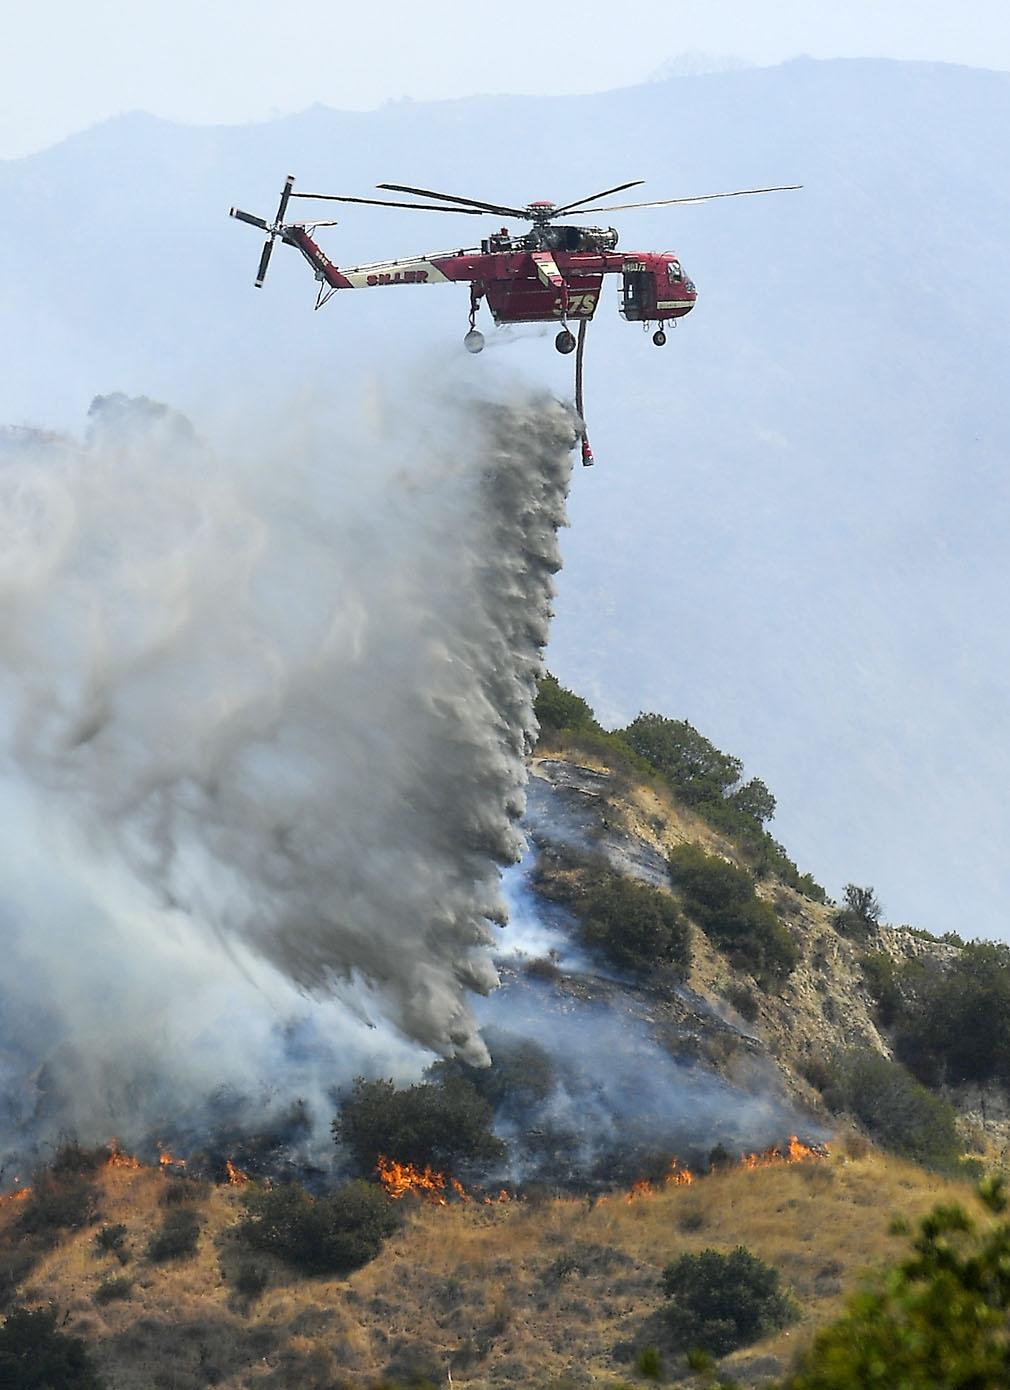 A Skycrane helicopter drops water on a hotspot in Burbank, California. (Associated Press)